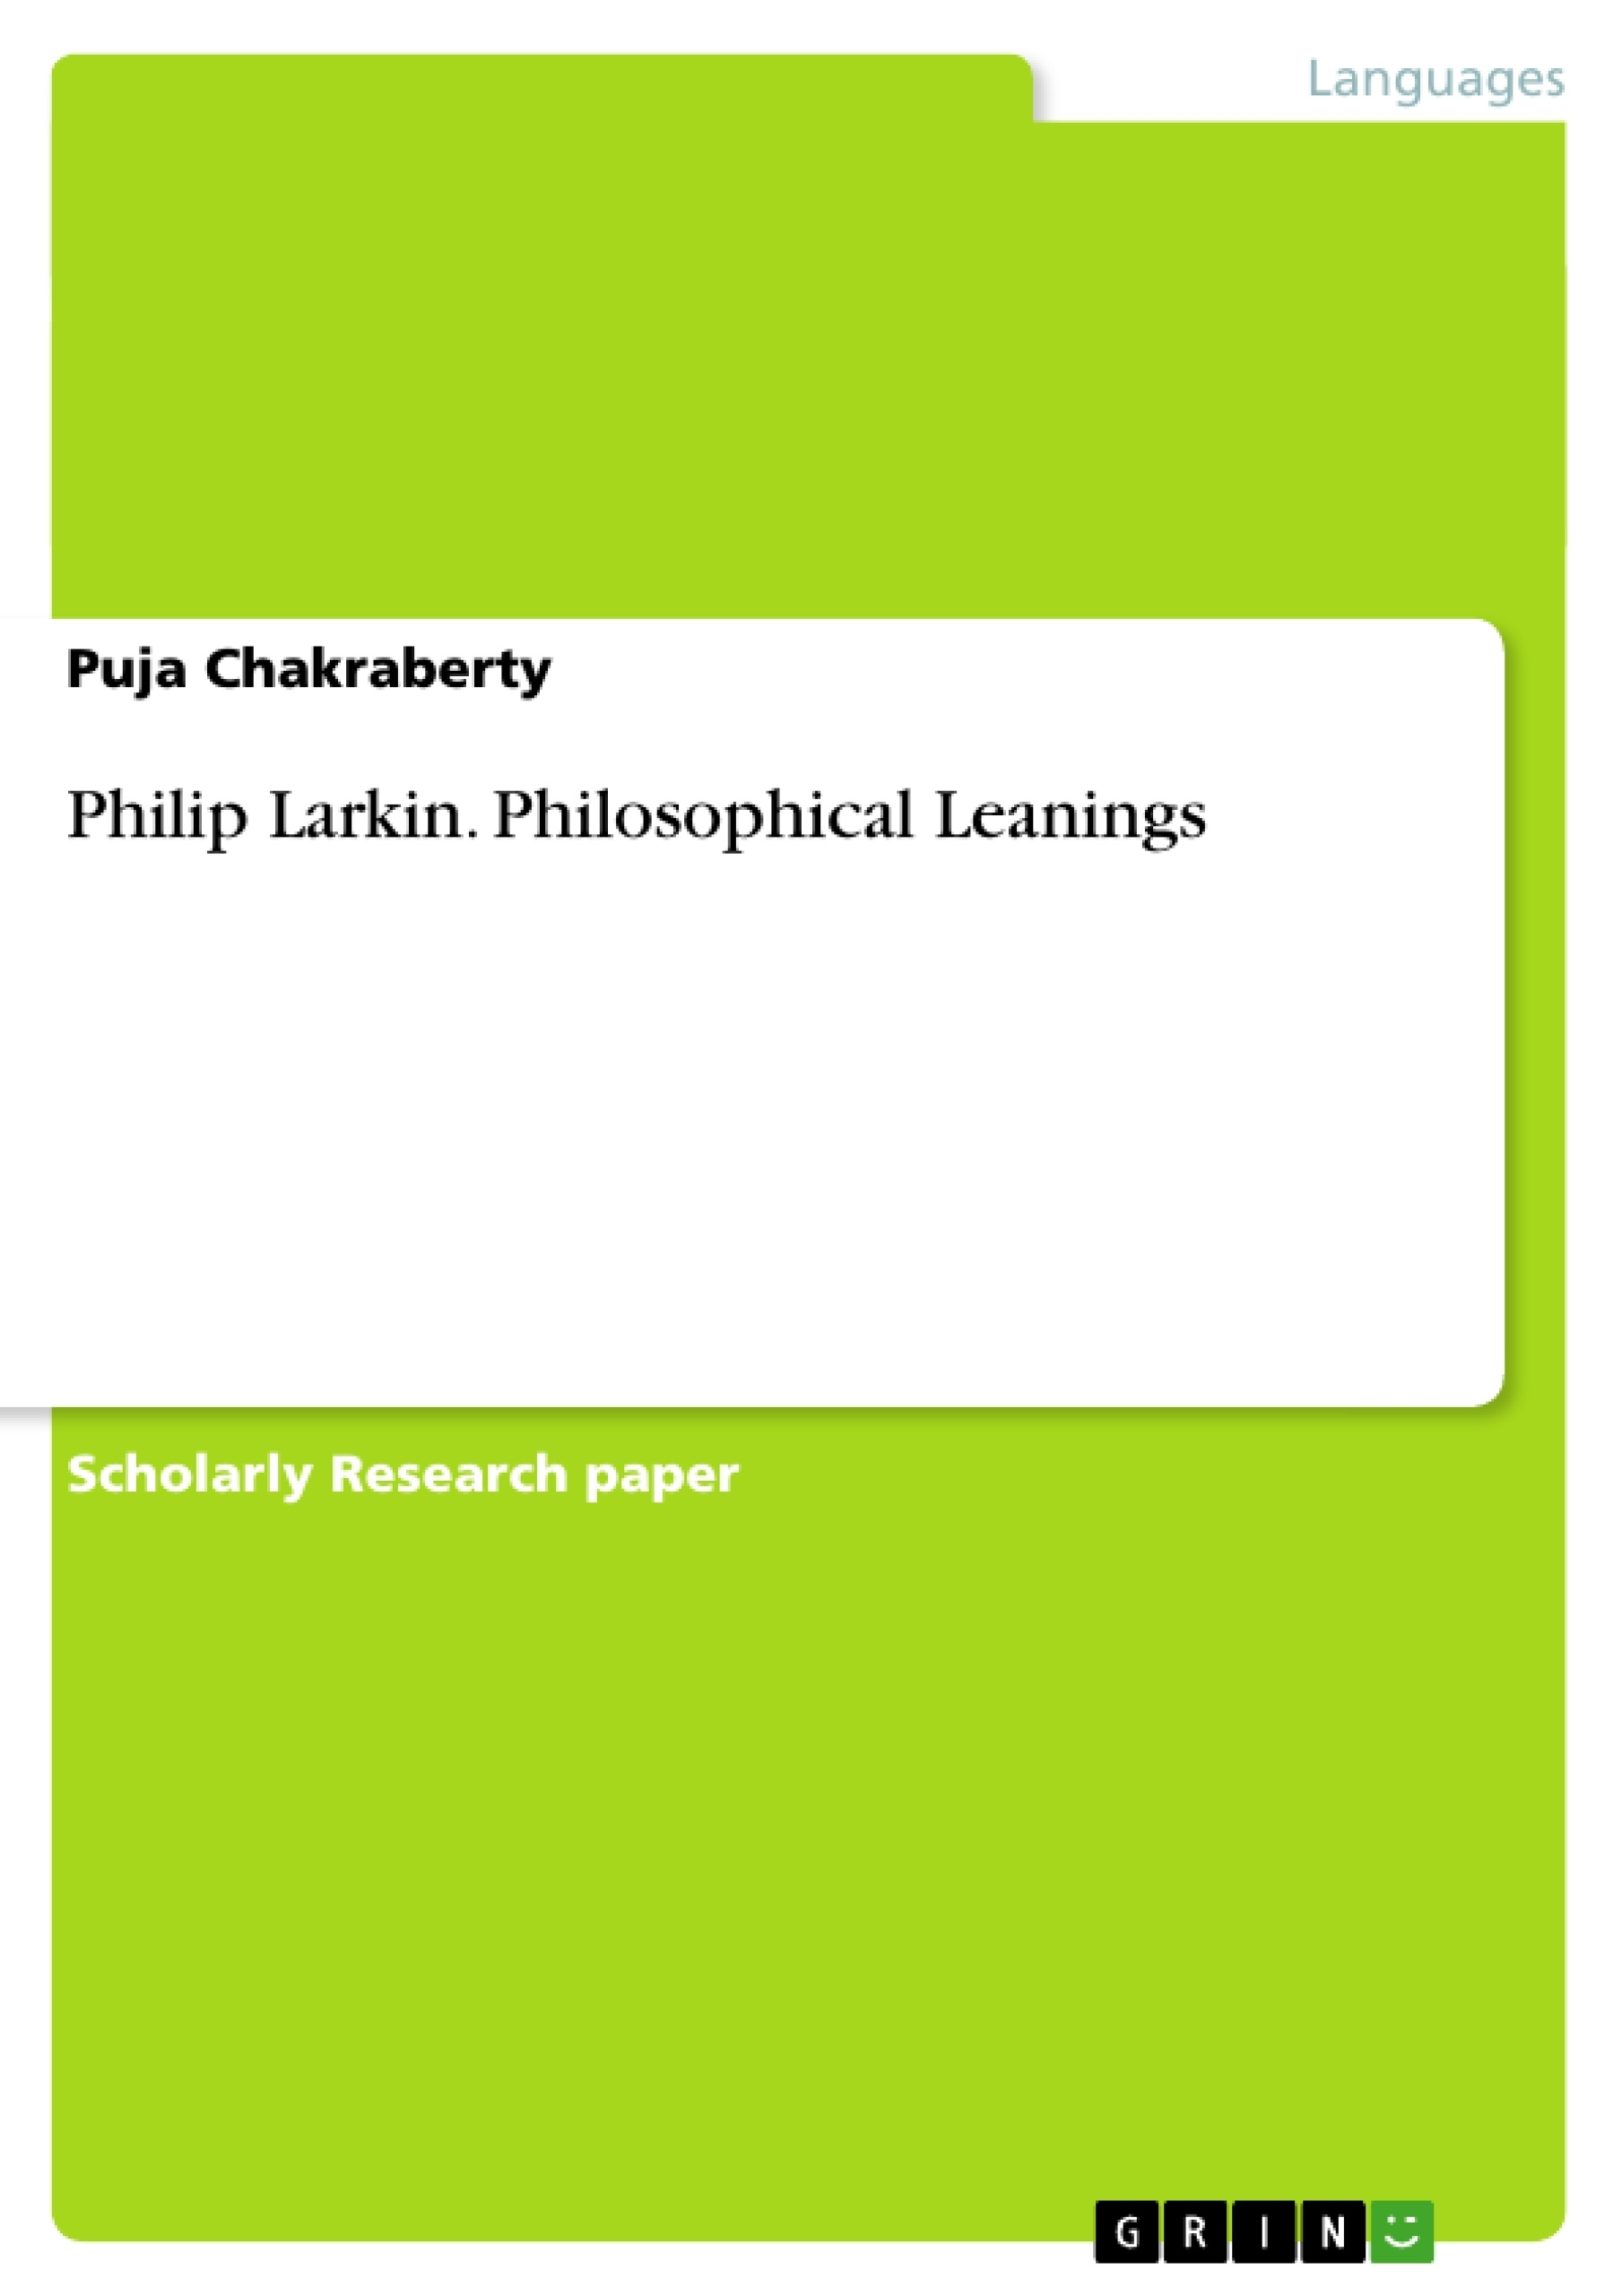 Title: Philip Larkin. Philosophical Leanings